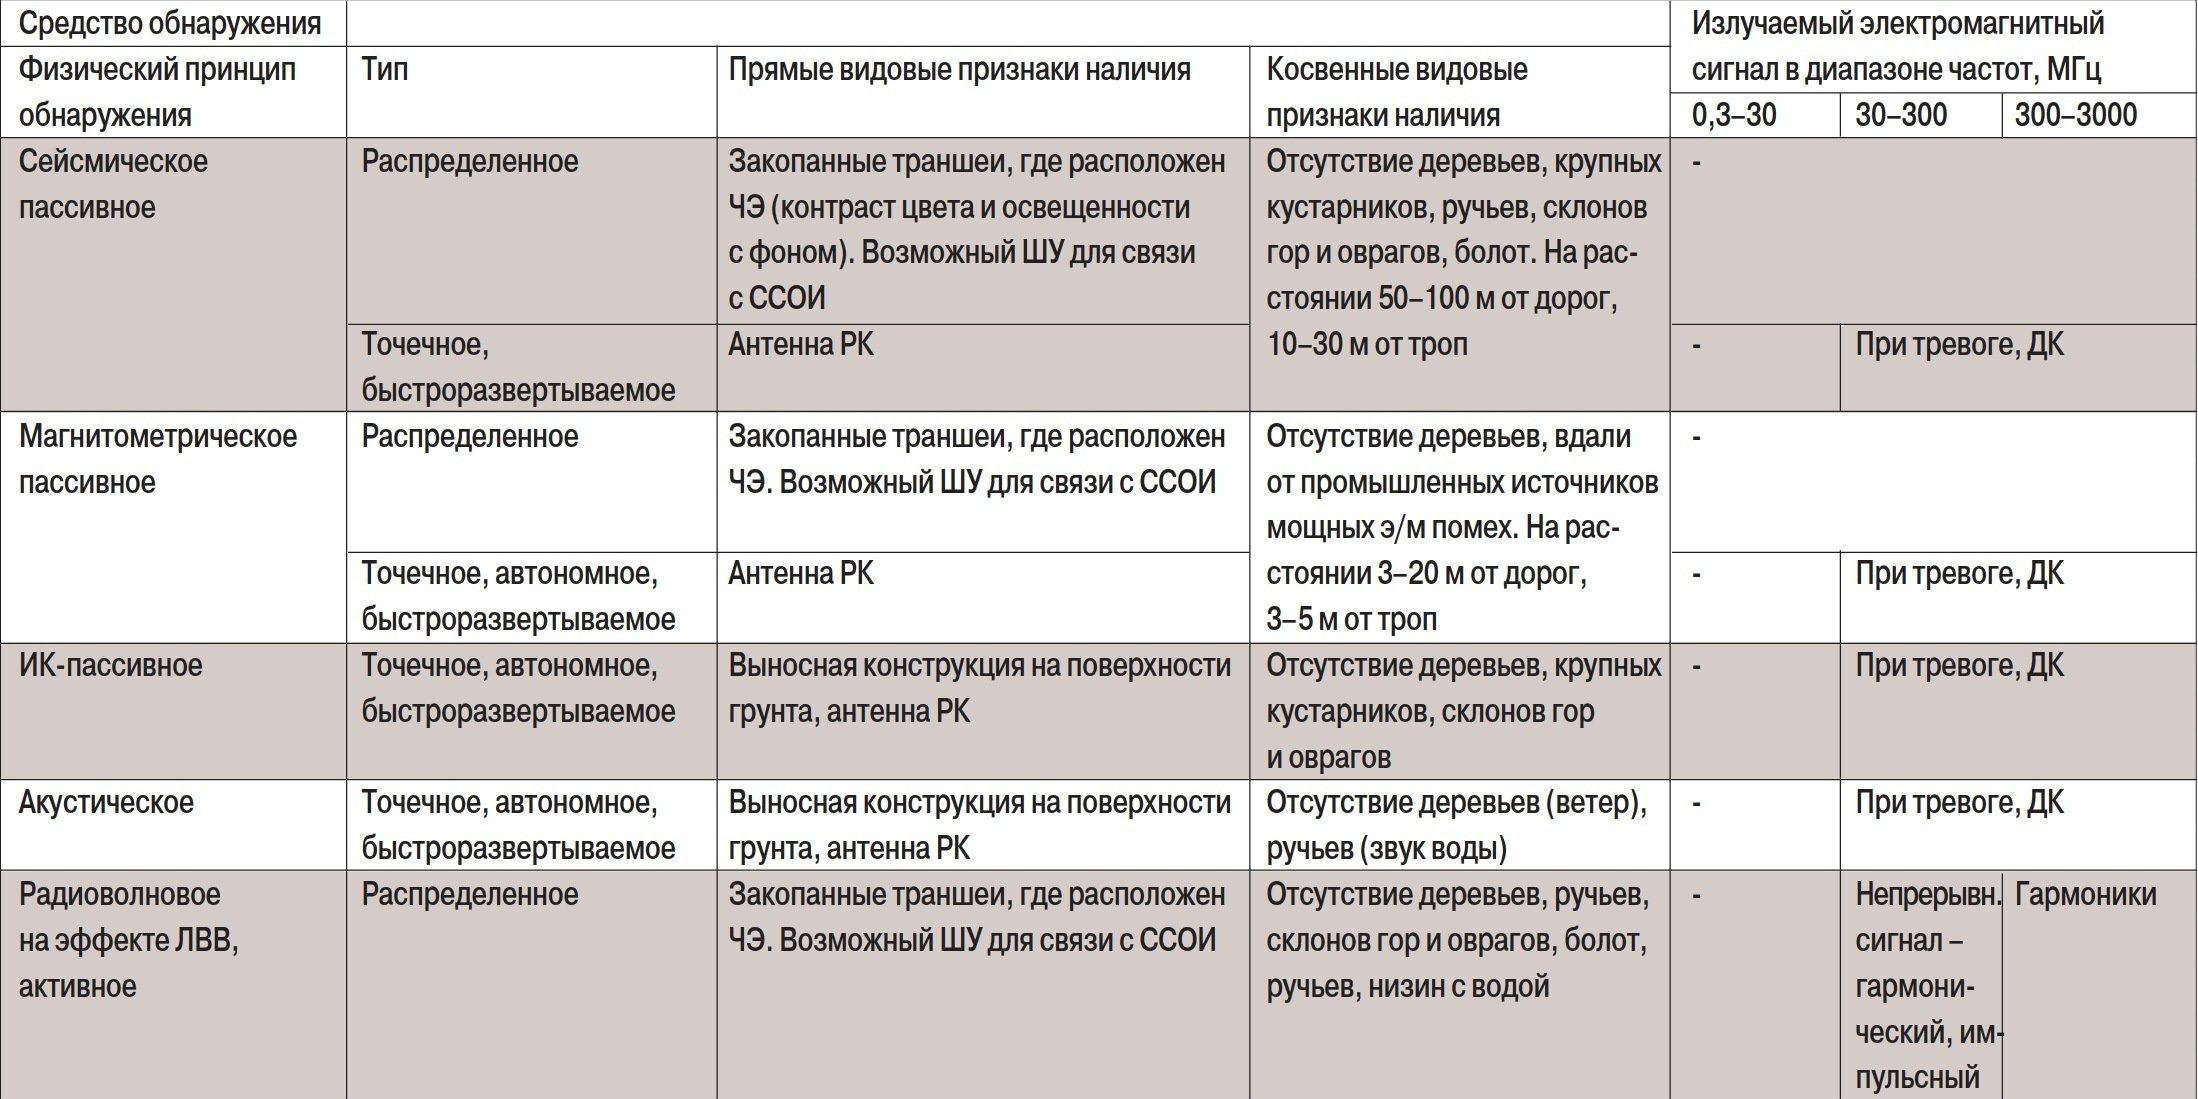 Demaskiruyushhie-priznaki1-1